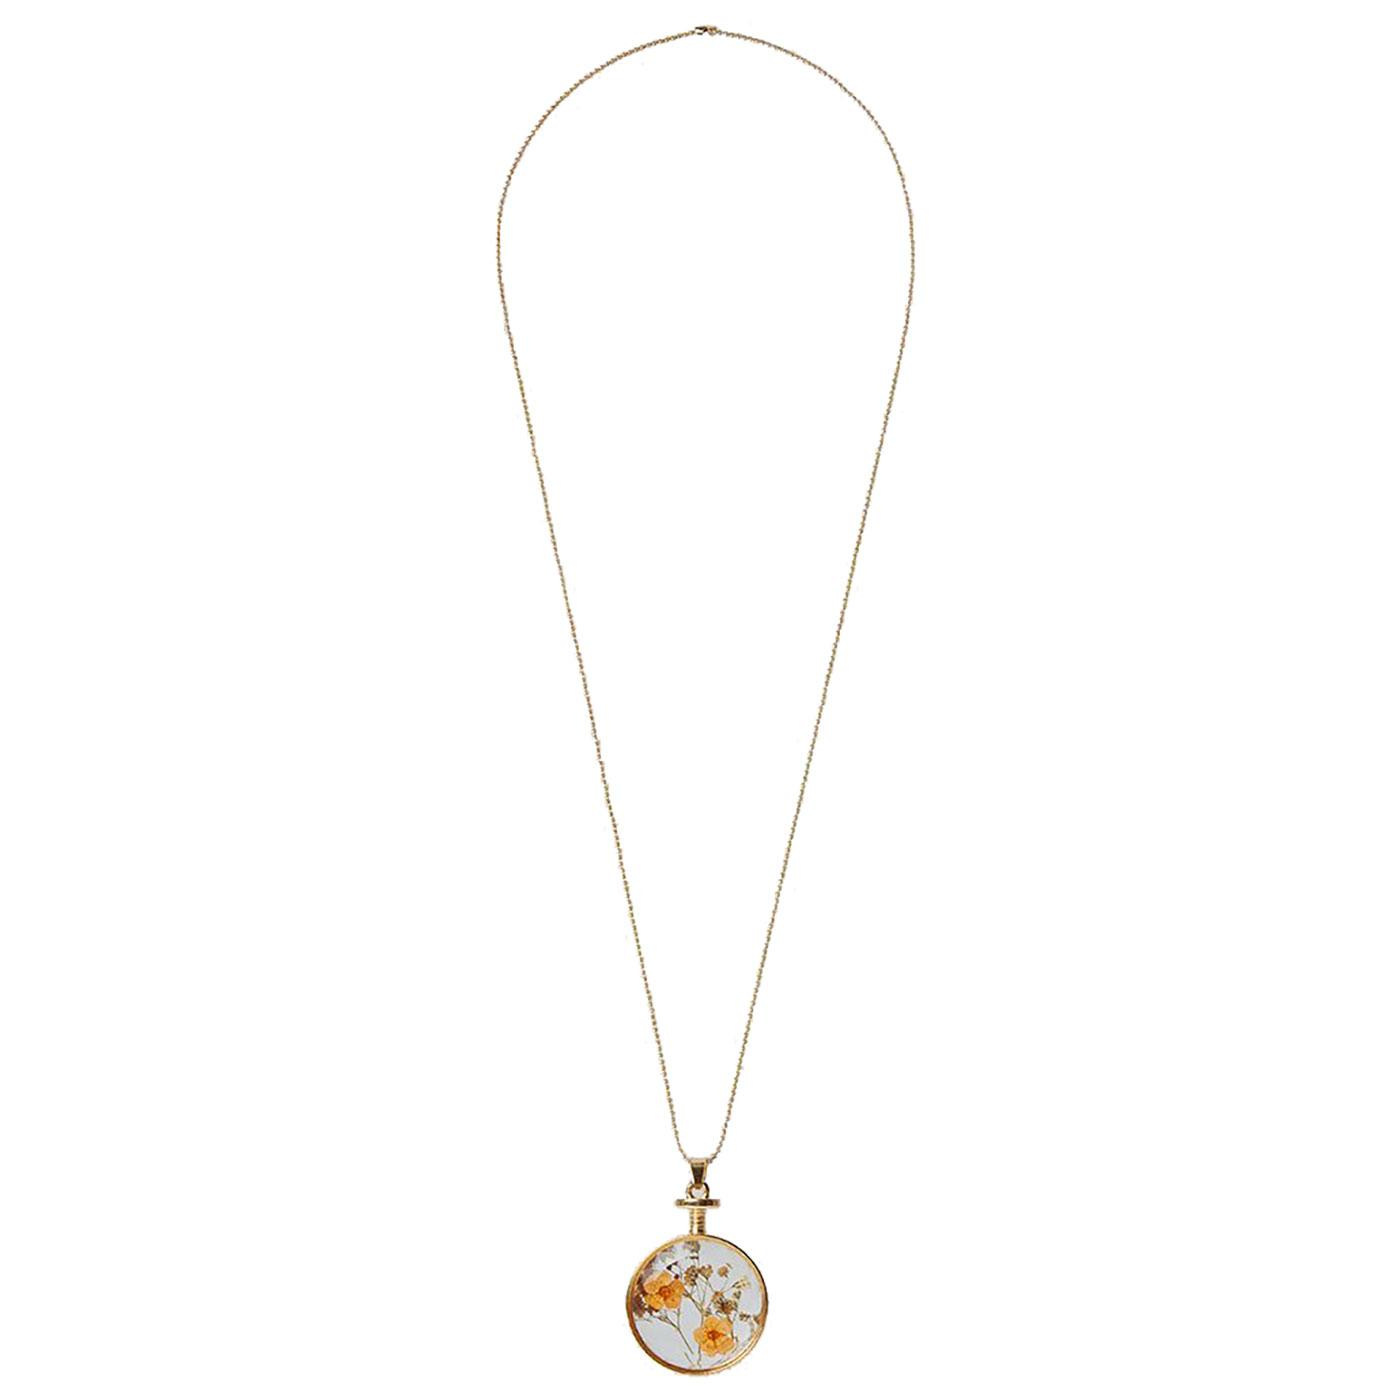 Bani LOUCHE Vintage Pressed Flower Necklace O